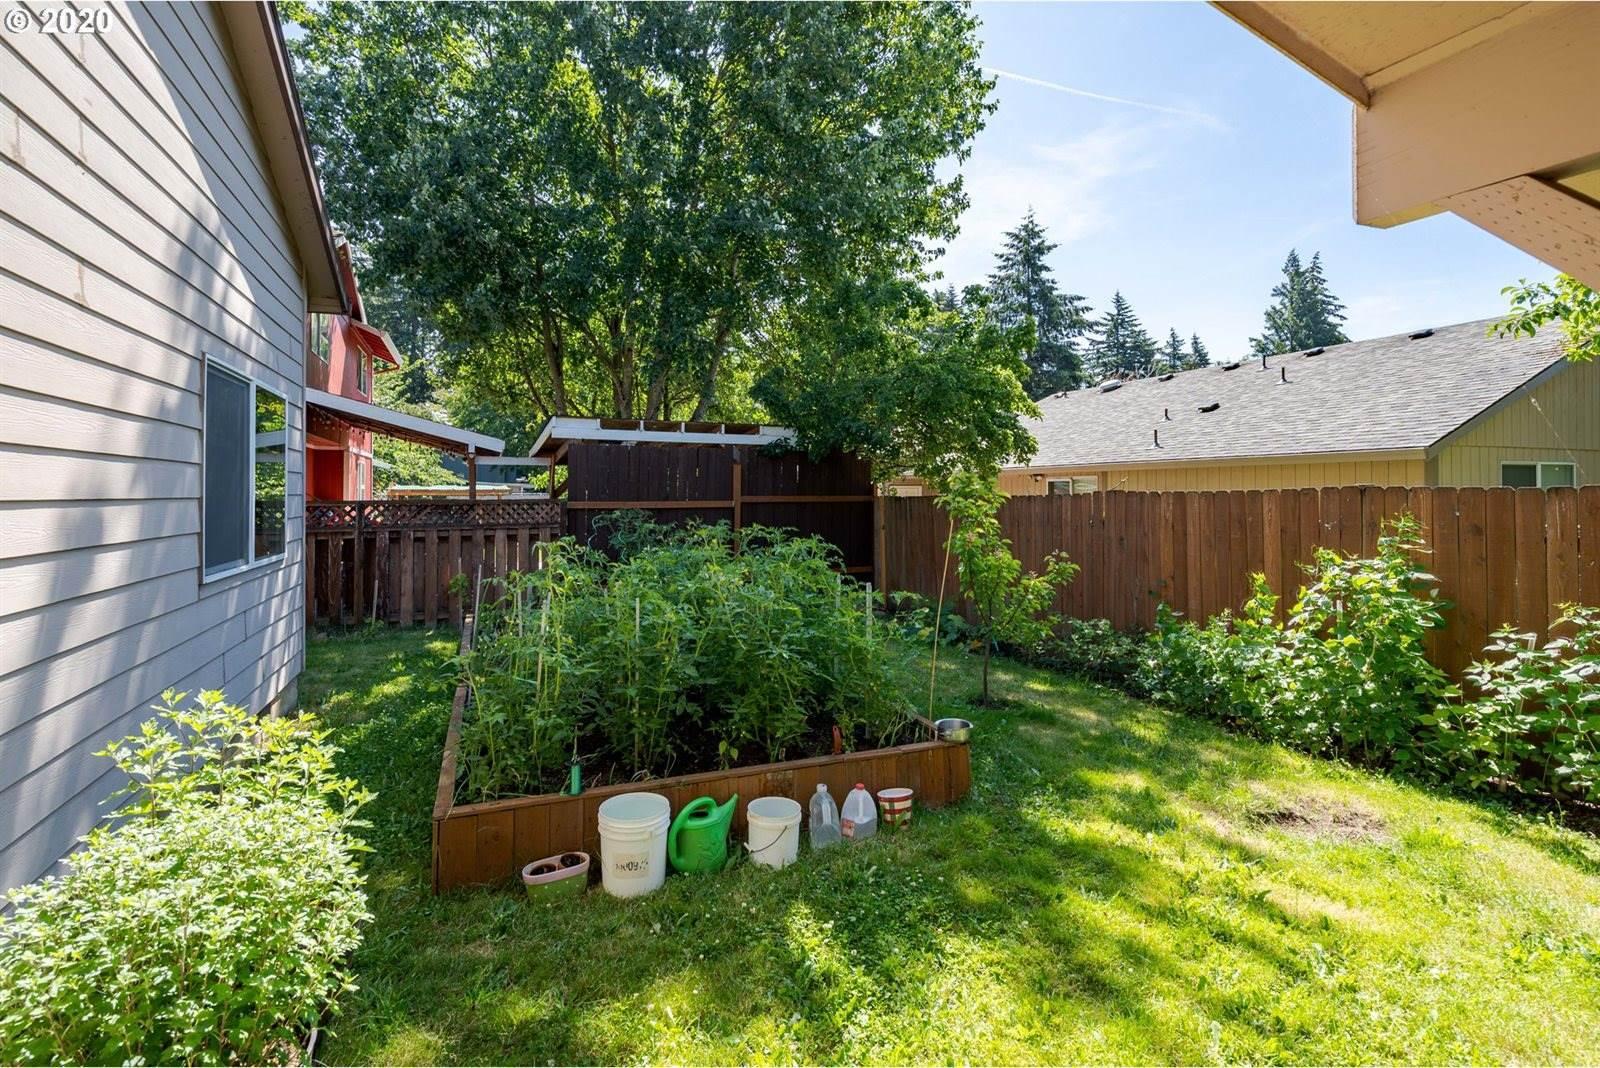 16826 SE Pine St, Portland, OR 97233